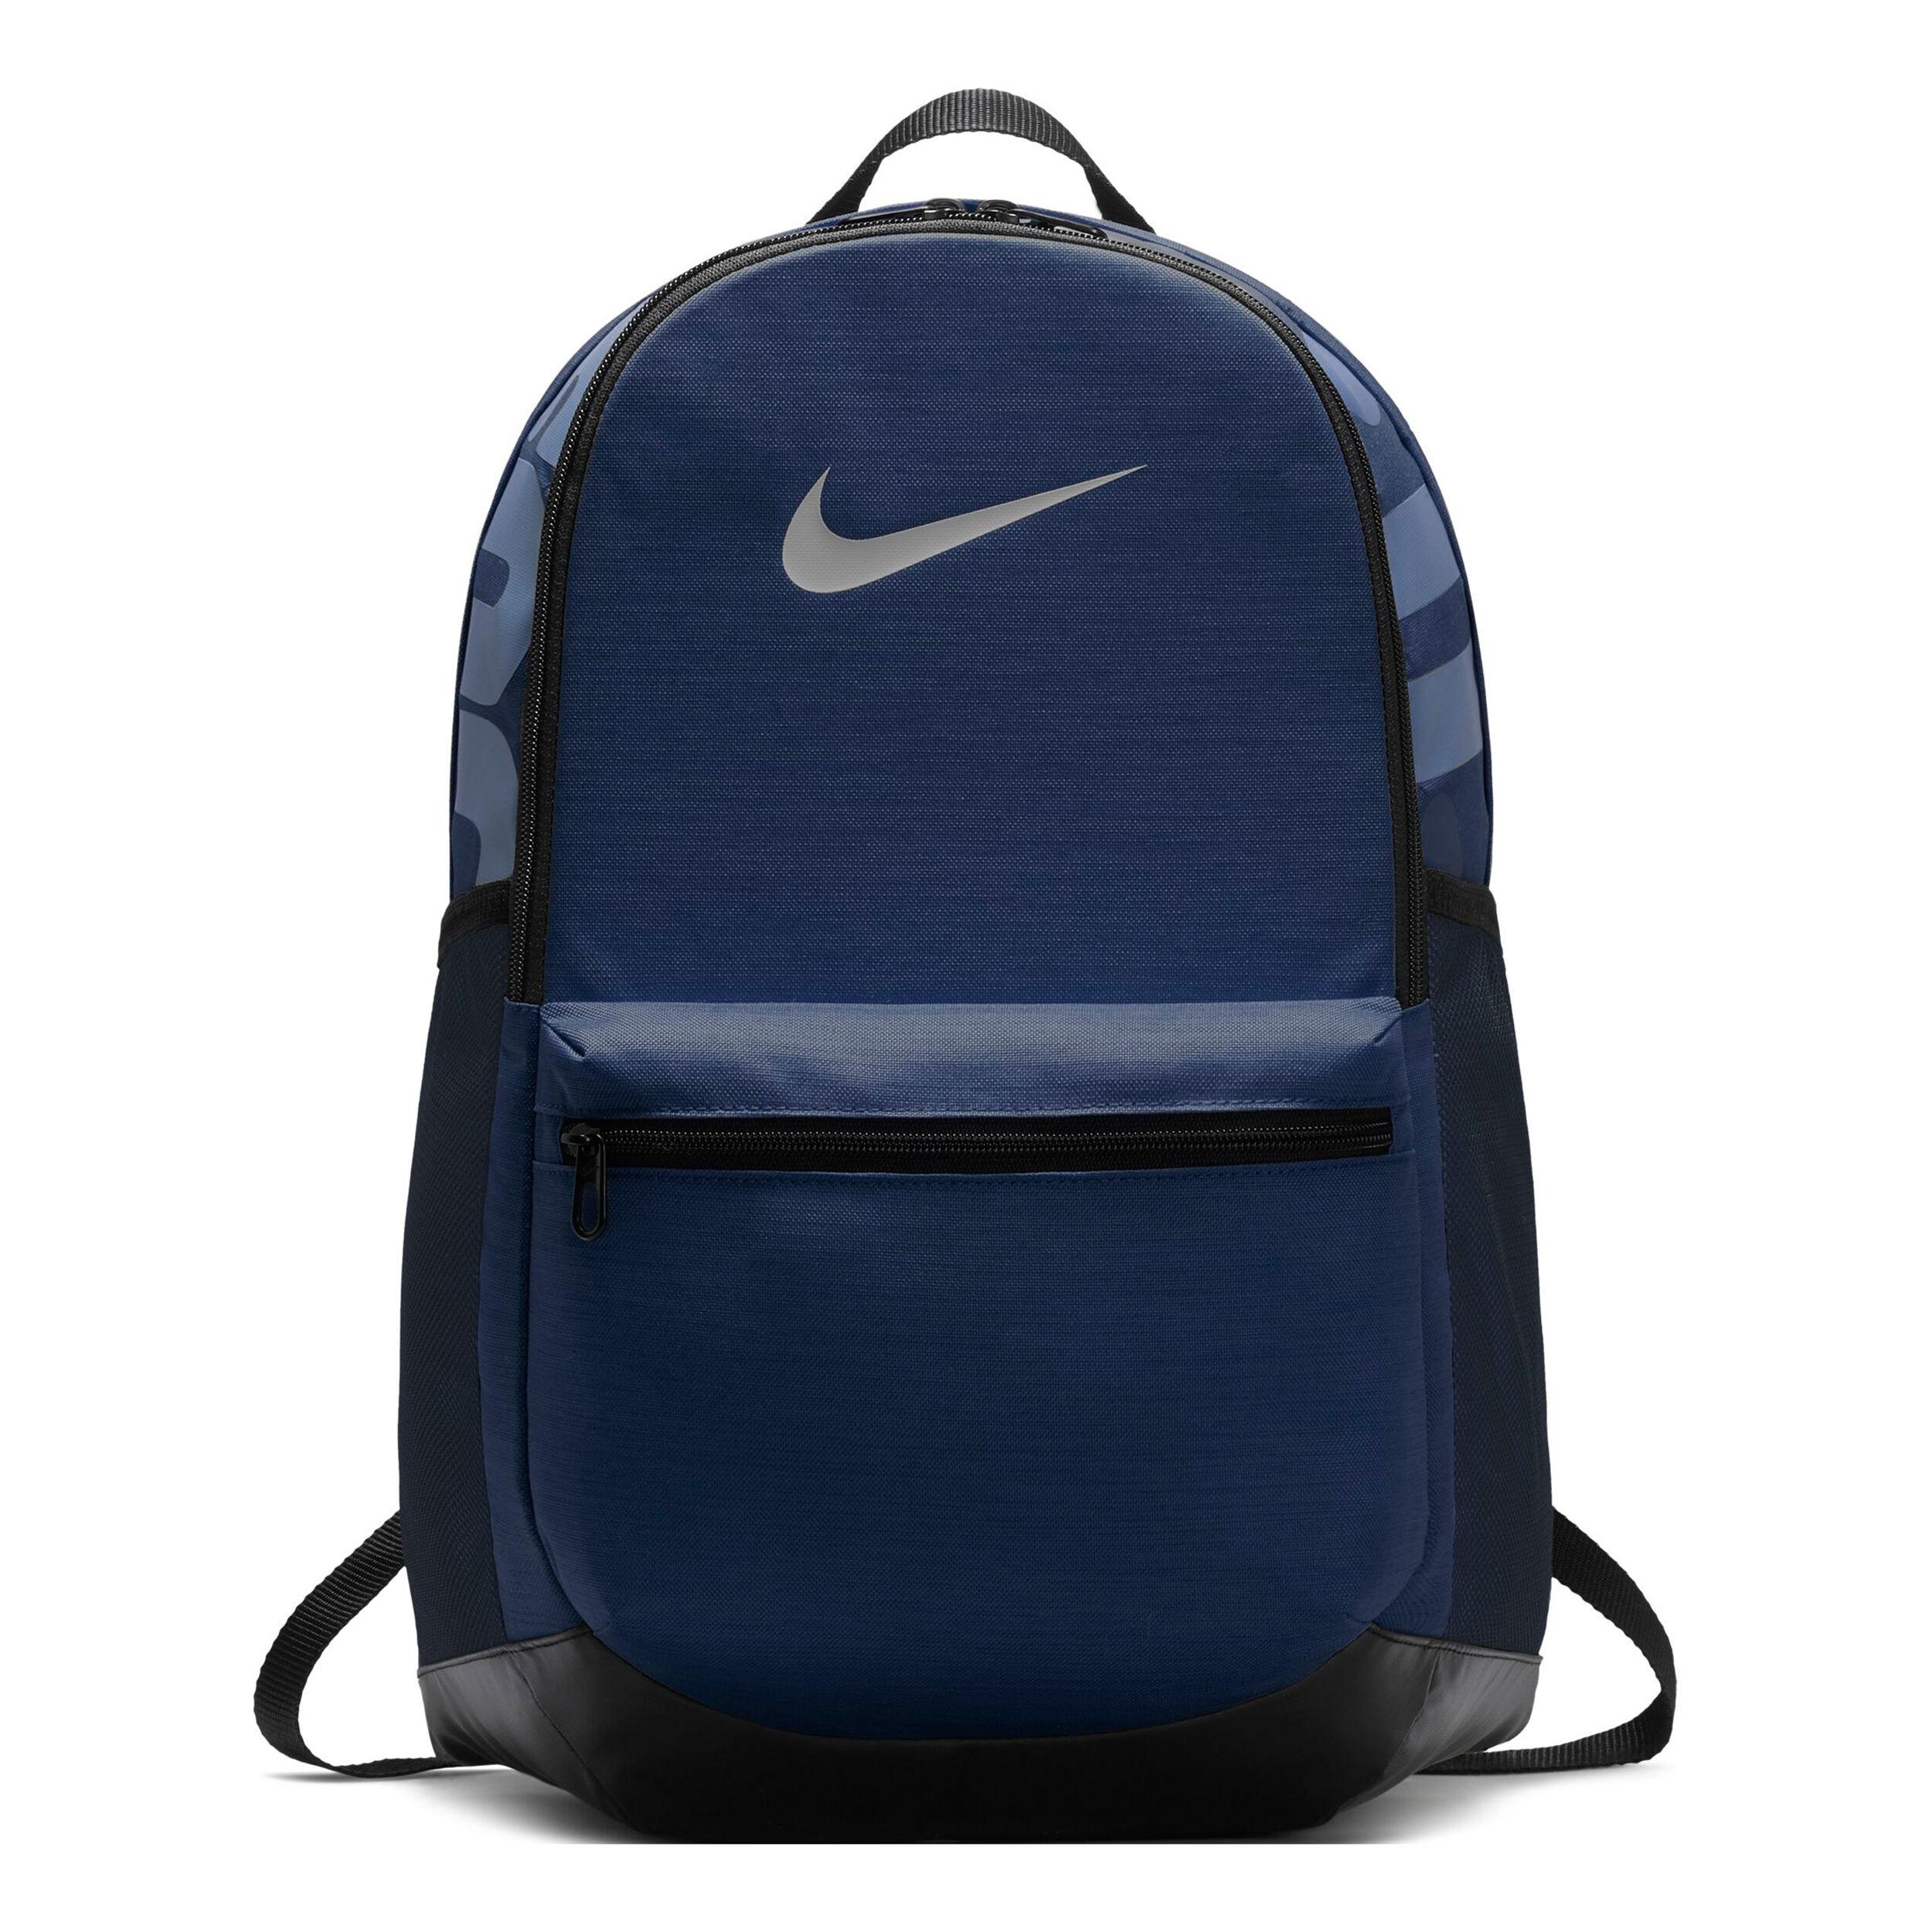 Nike Brasilia Training Rucksack Mittel Dunkelblau, Schwarz